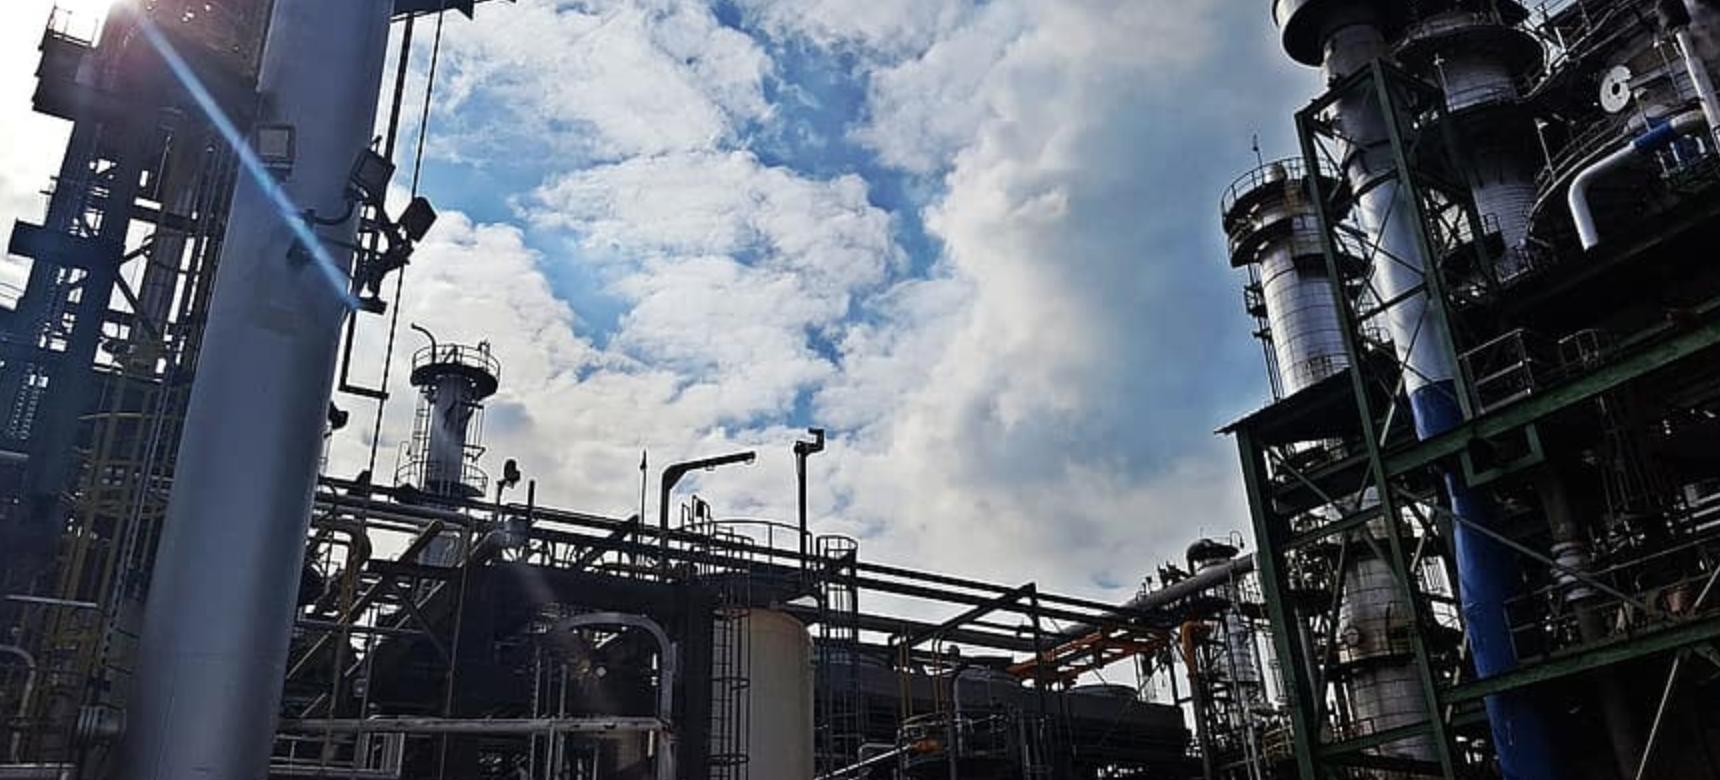 Egypte : Alexandria Petroleum va moderniser sa raffinerie d'Alexandrie pour 250 millions de $ 1